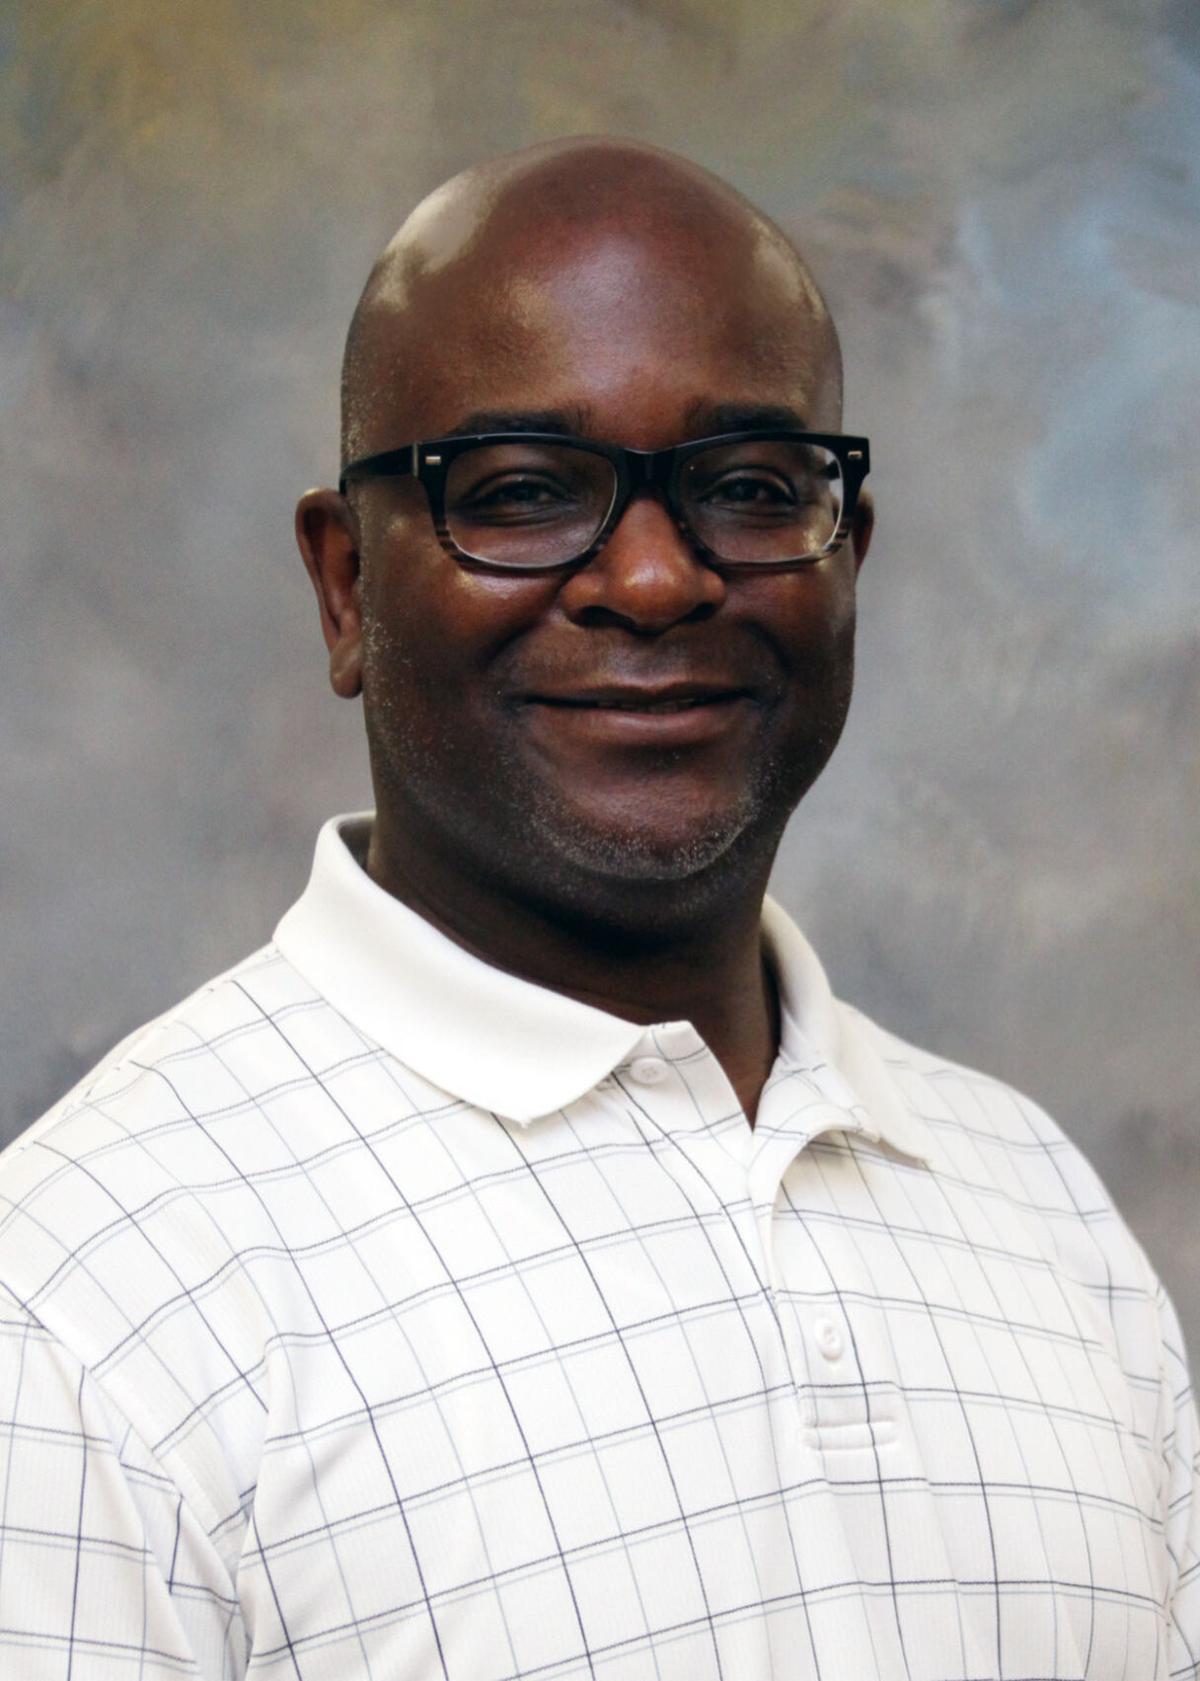 Methodist Hospitals adds two directors to leadership team